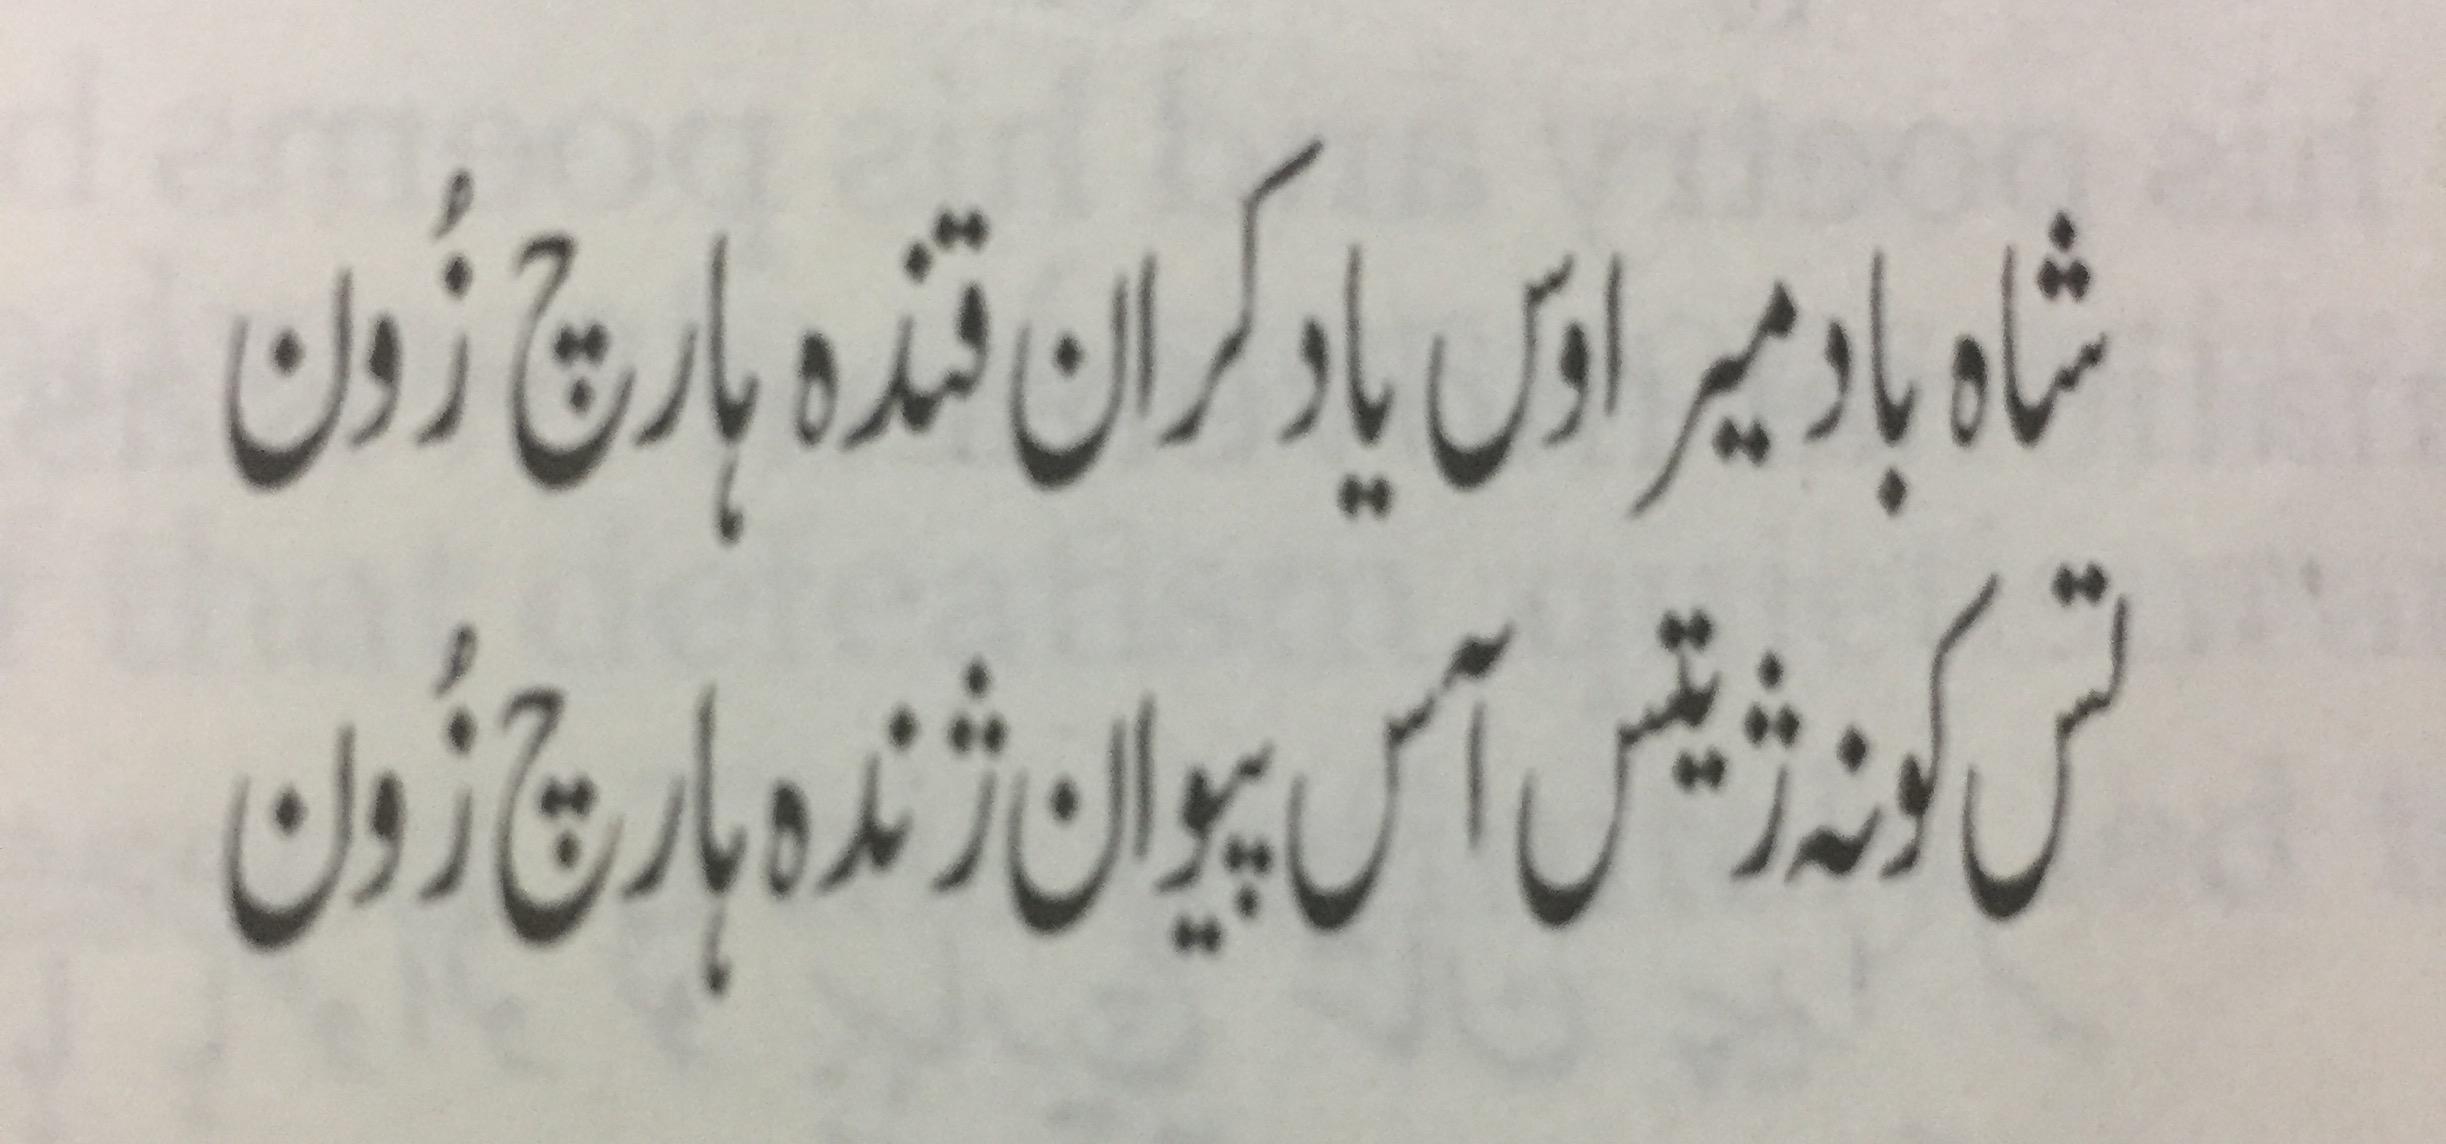 tct-urdu-1